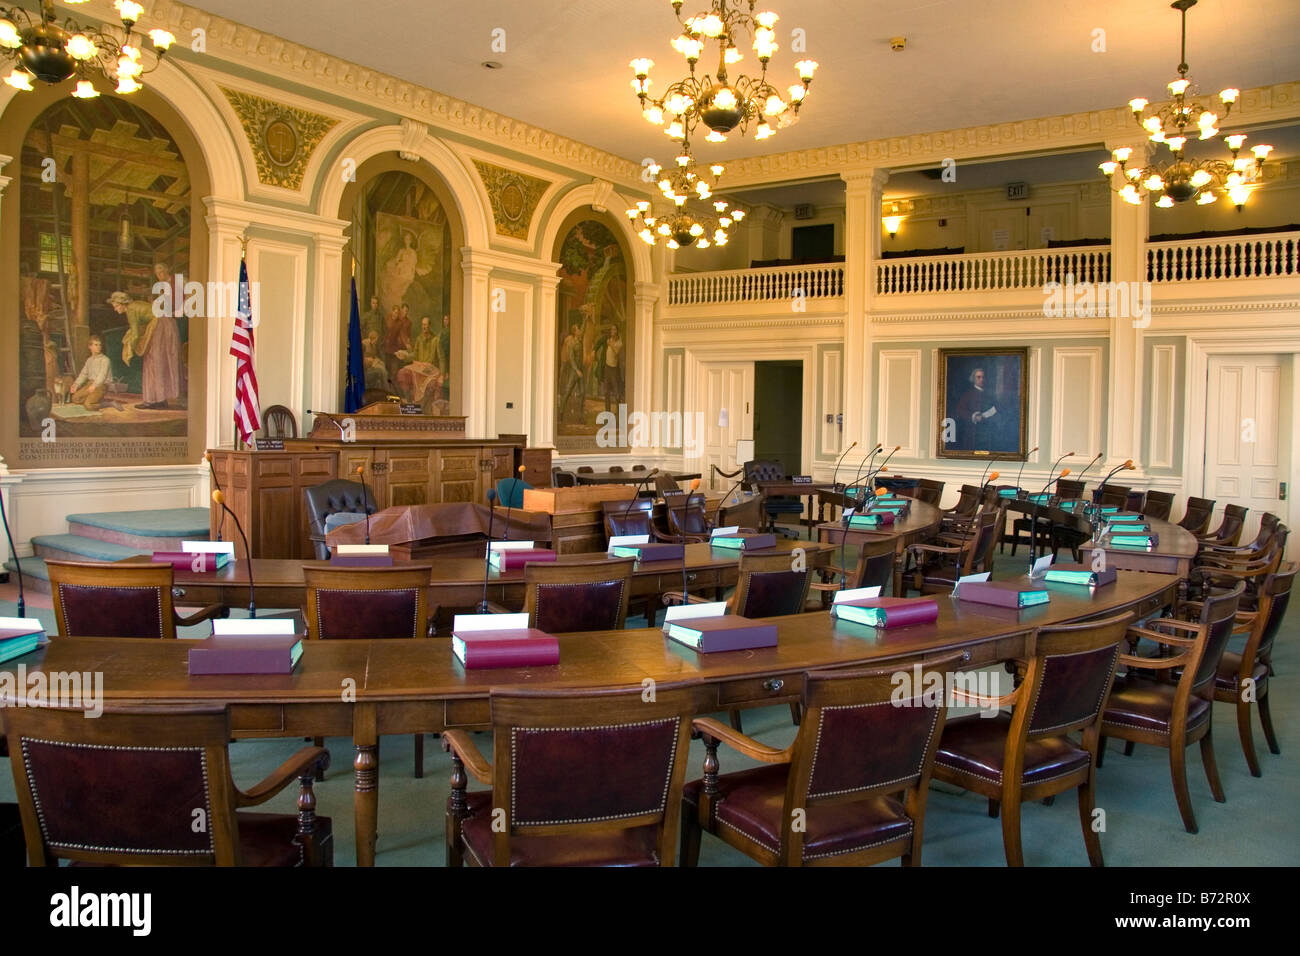 Senate Chamber Stock Photos & Senate Chamber Stock Images - Alamy